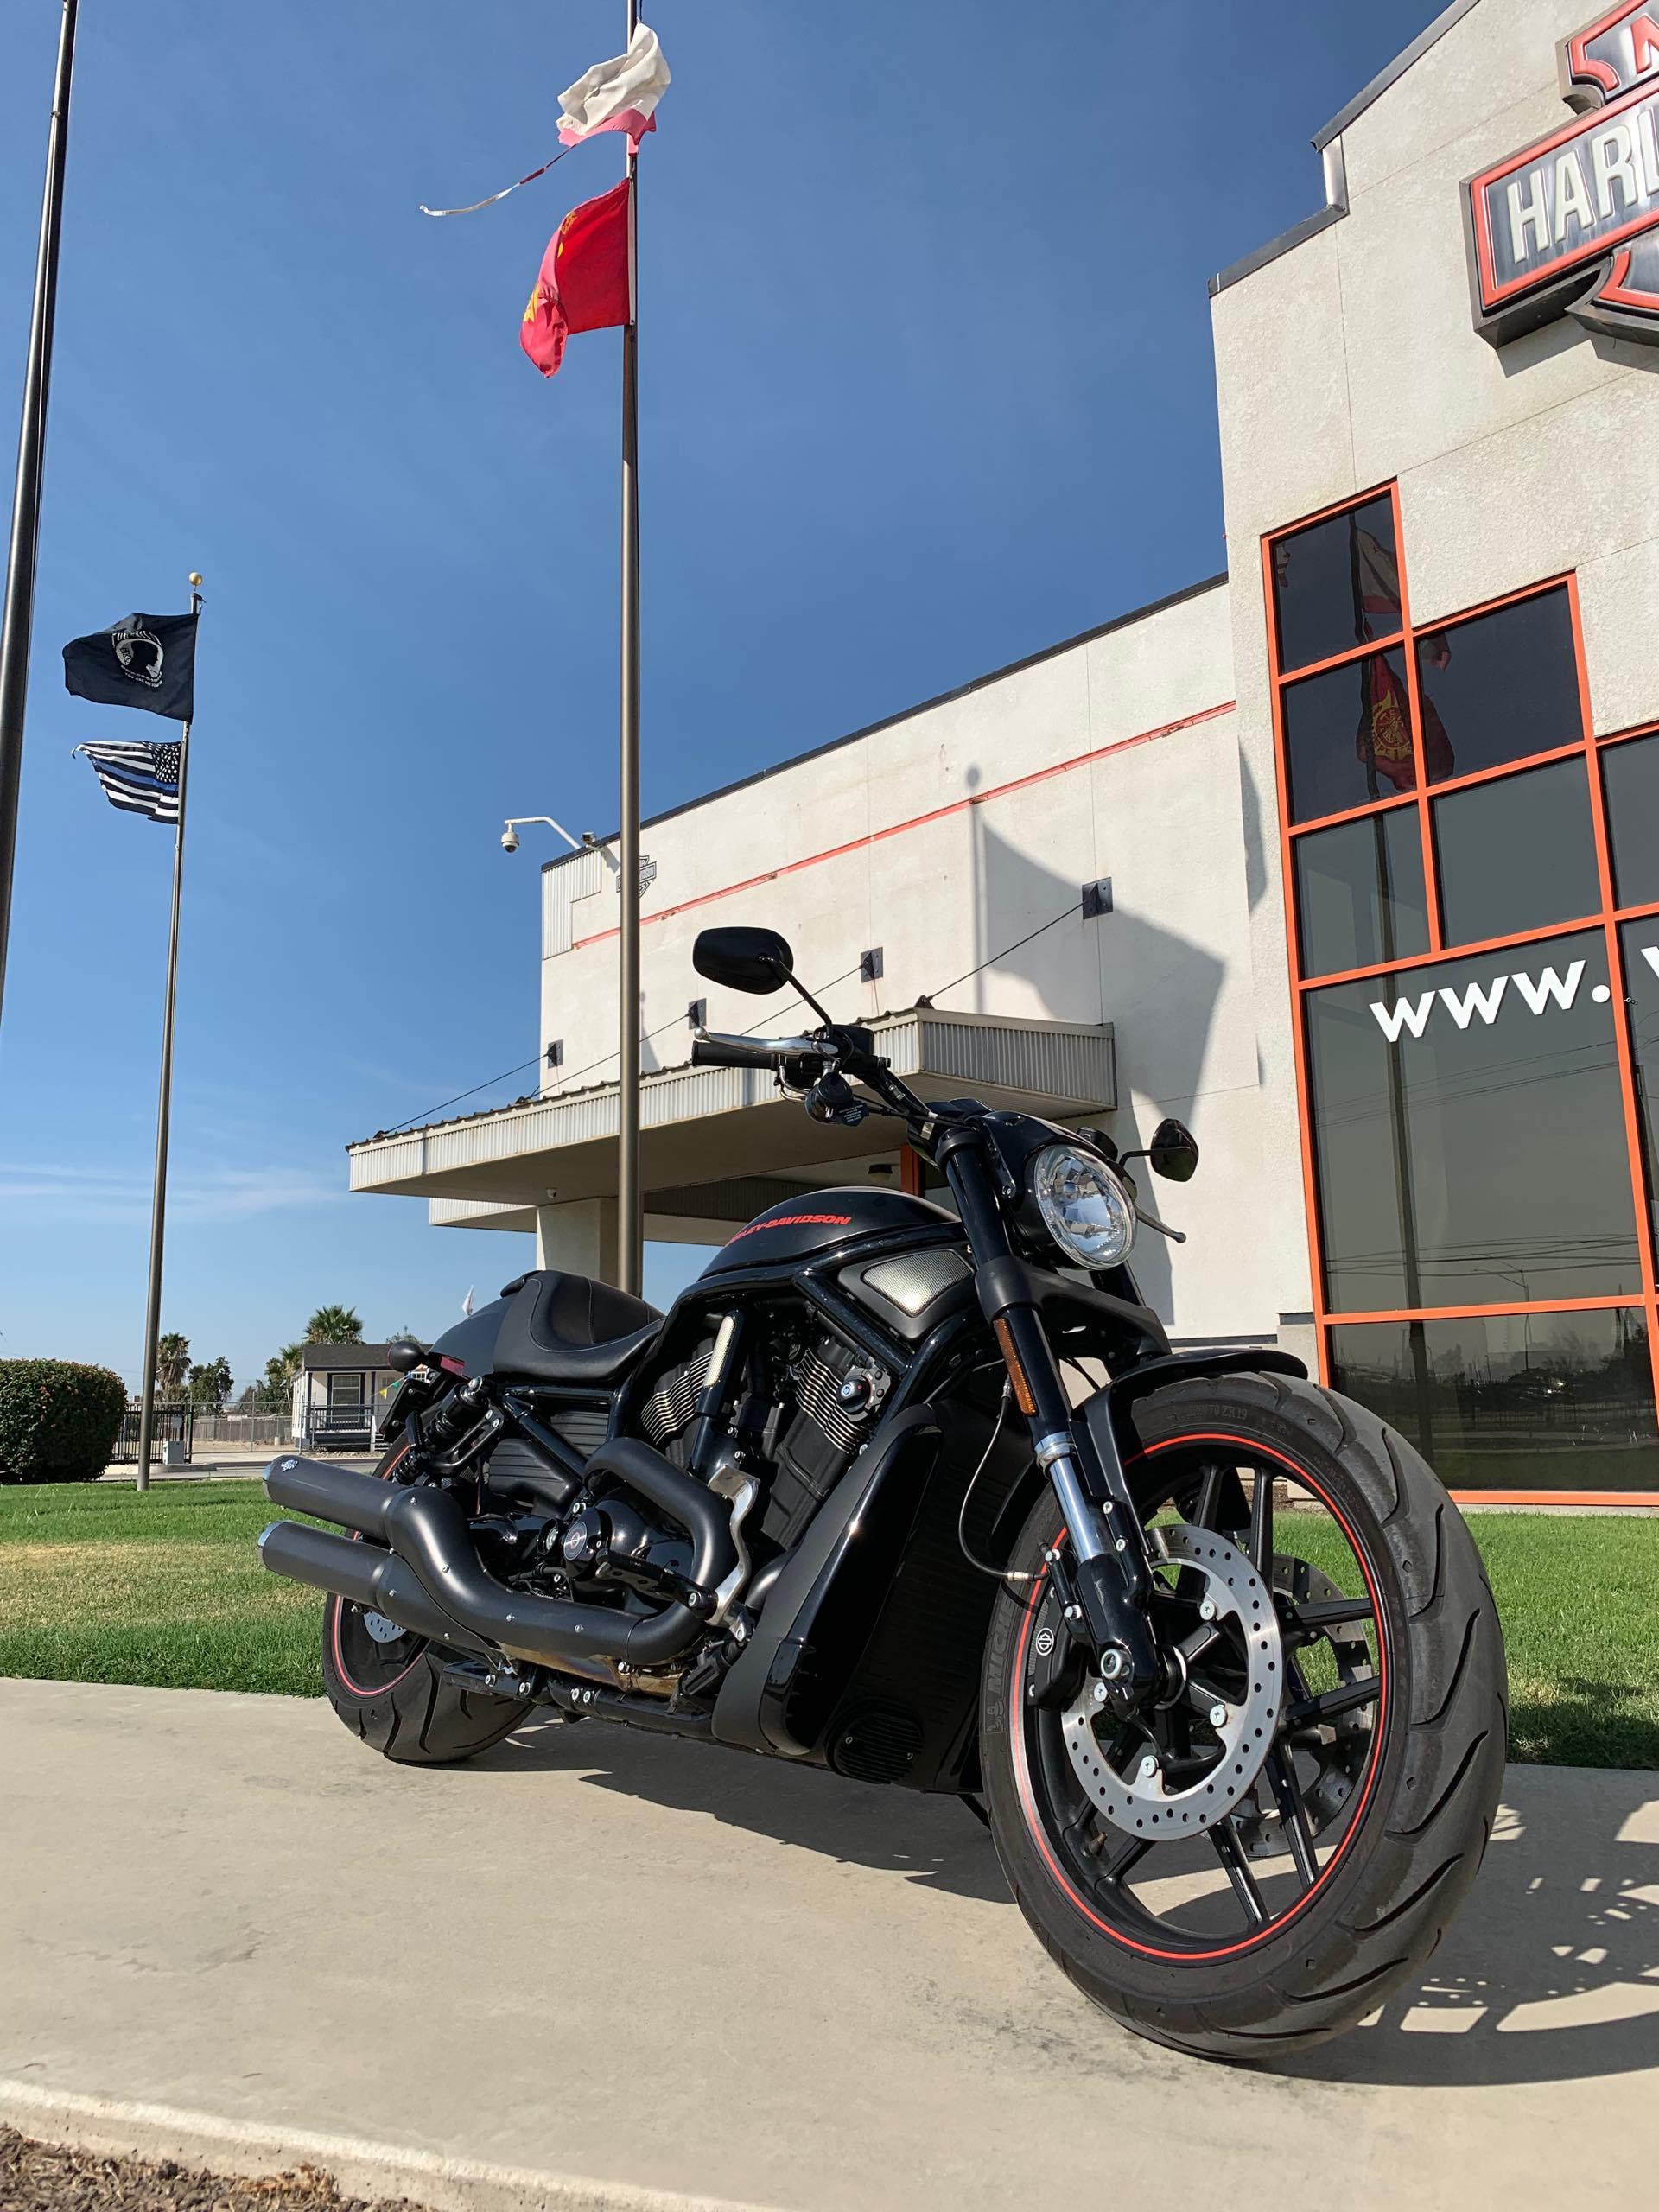 2015 Harley-Davidson V-Rod Night Rod Special at Visalia Harley-Davidson